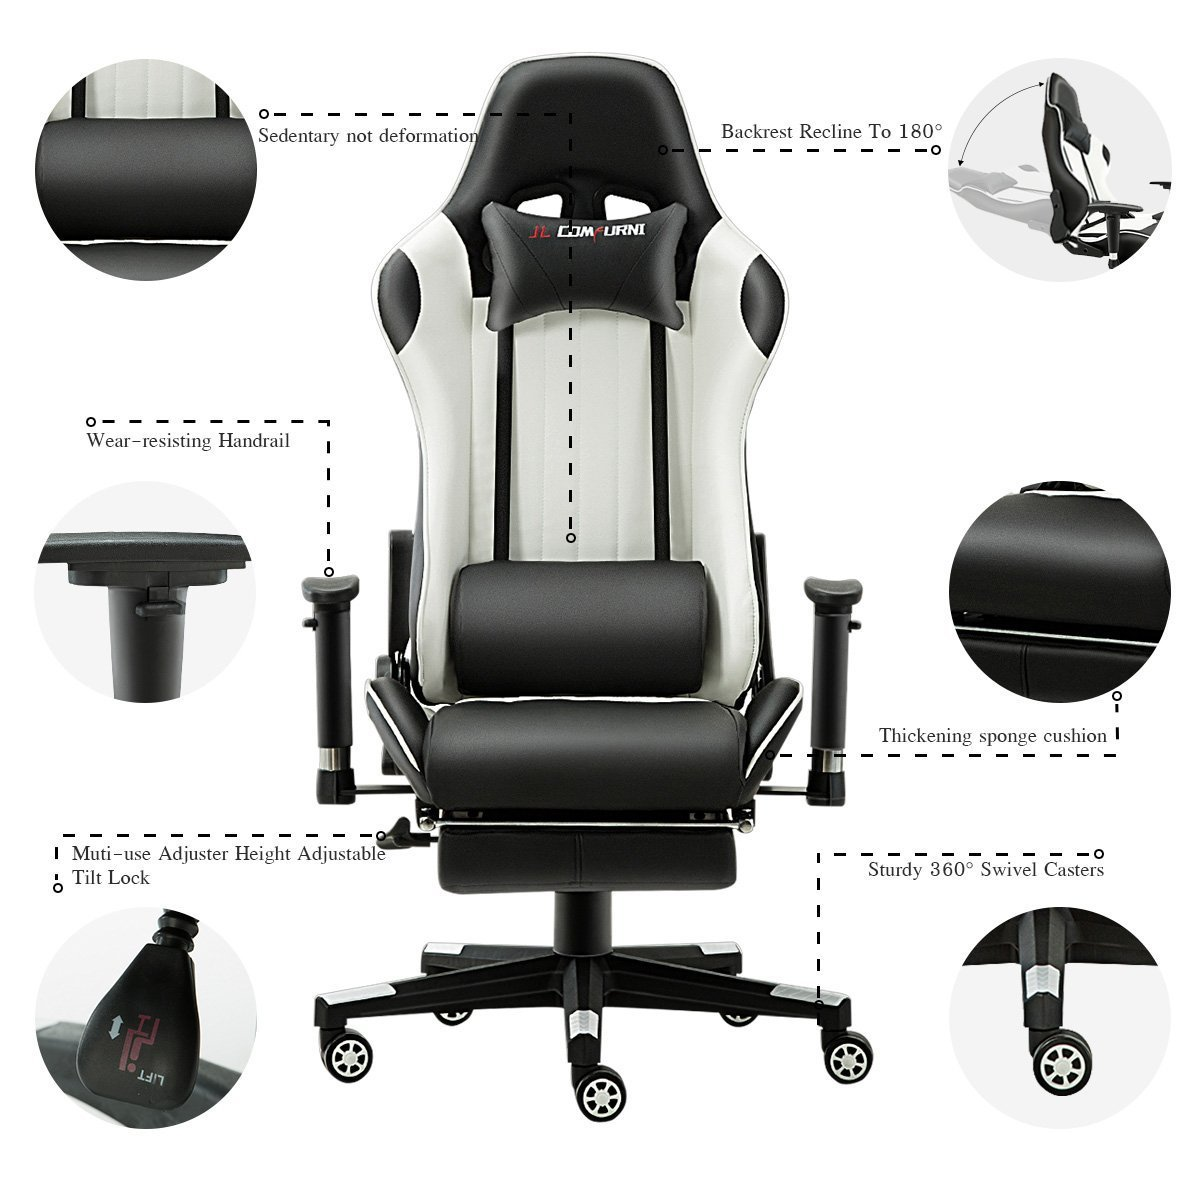 Silla de gaming de JL Comfurni, silla ergonómica giratoria de piel sintética, para casa, oficina y escritorio, reclinable, silla de estilo deportivo ...